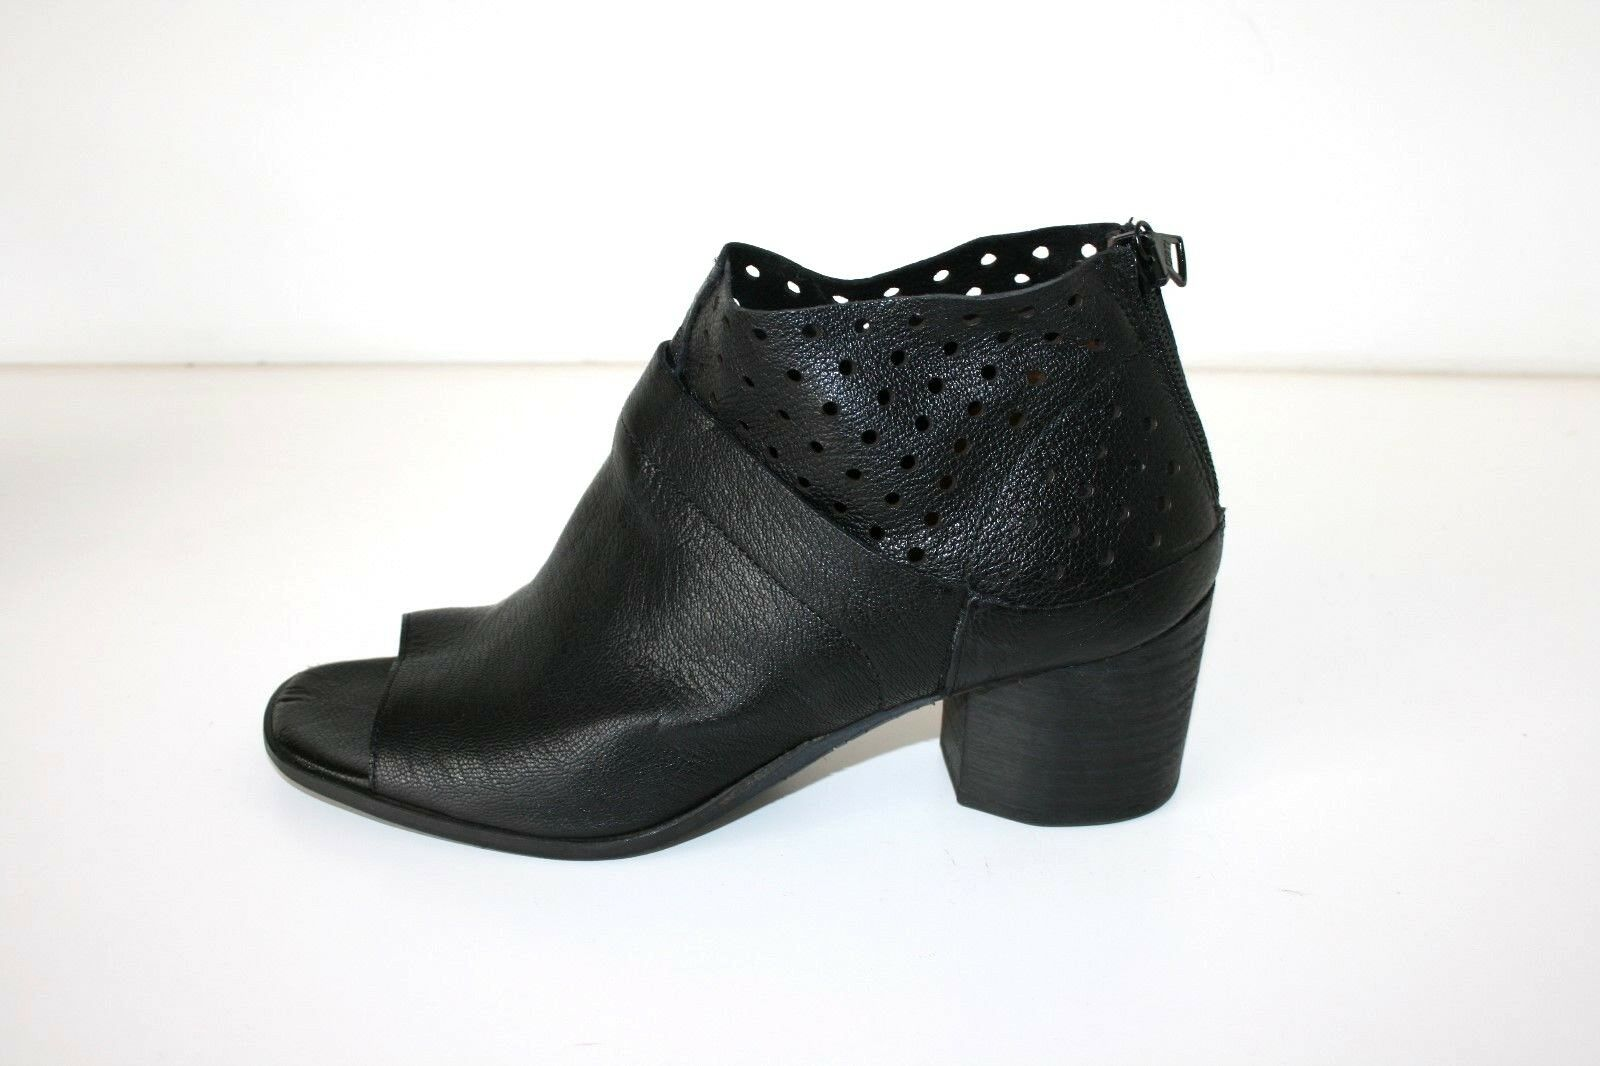 FILIPPO RAPHAEL schwarz Leder block heel schuhe - Größe 37, 249 AS NEW